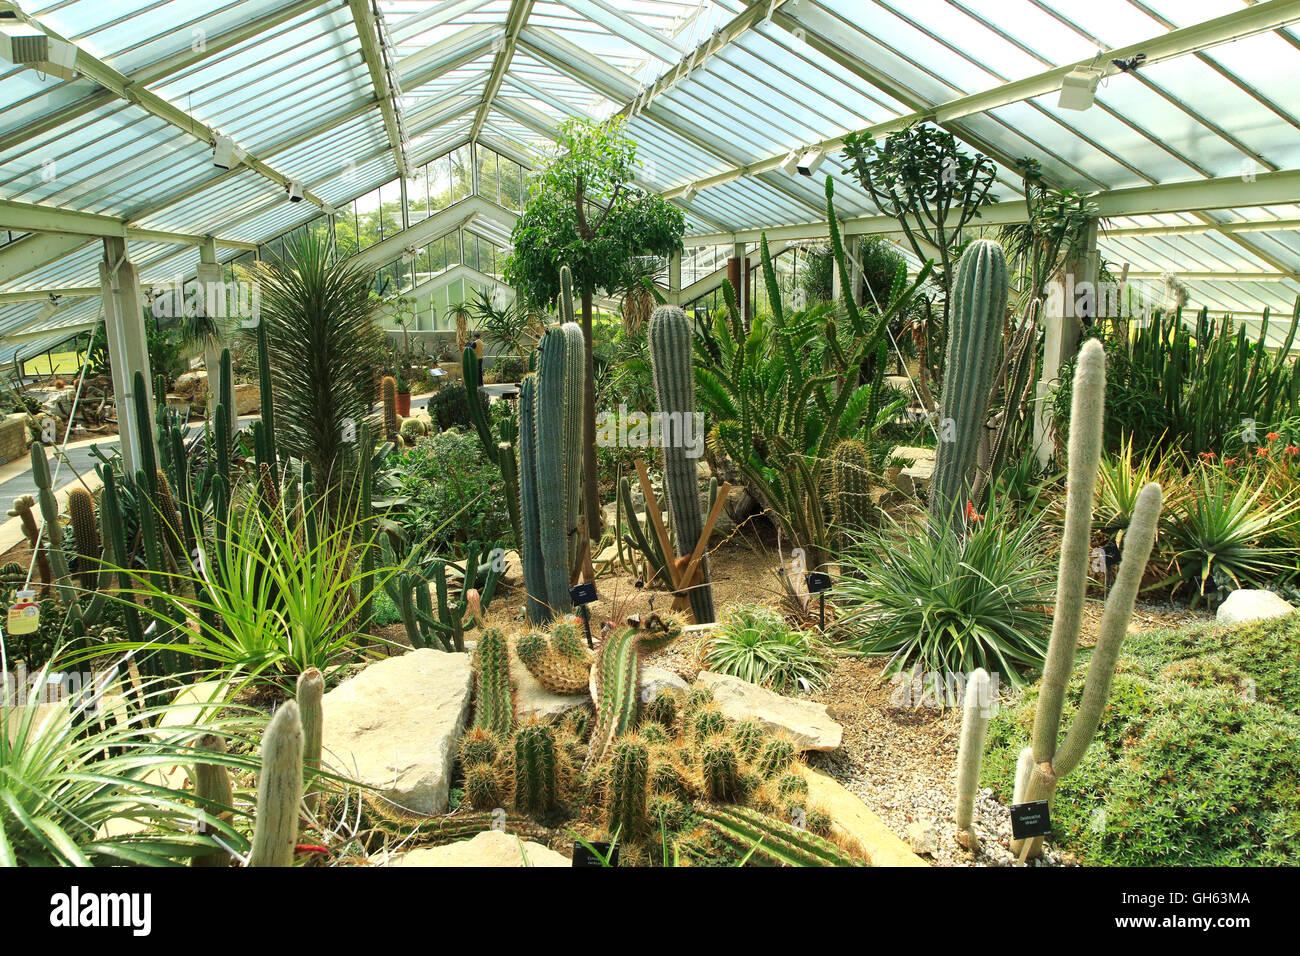 Royal botanical gardens greenhouse garden ftempo - Garden state orthopedics fair lawn ...